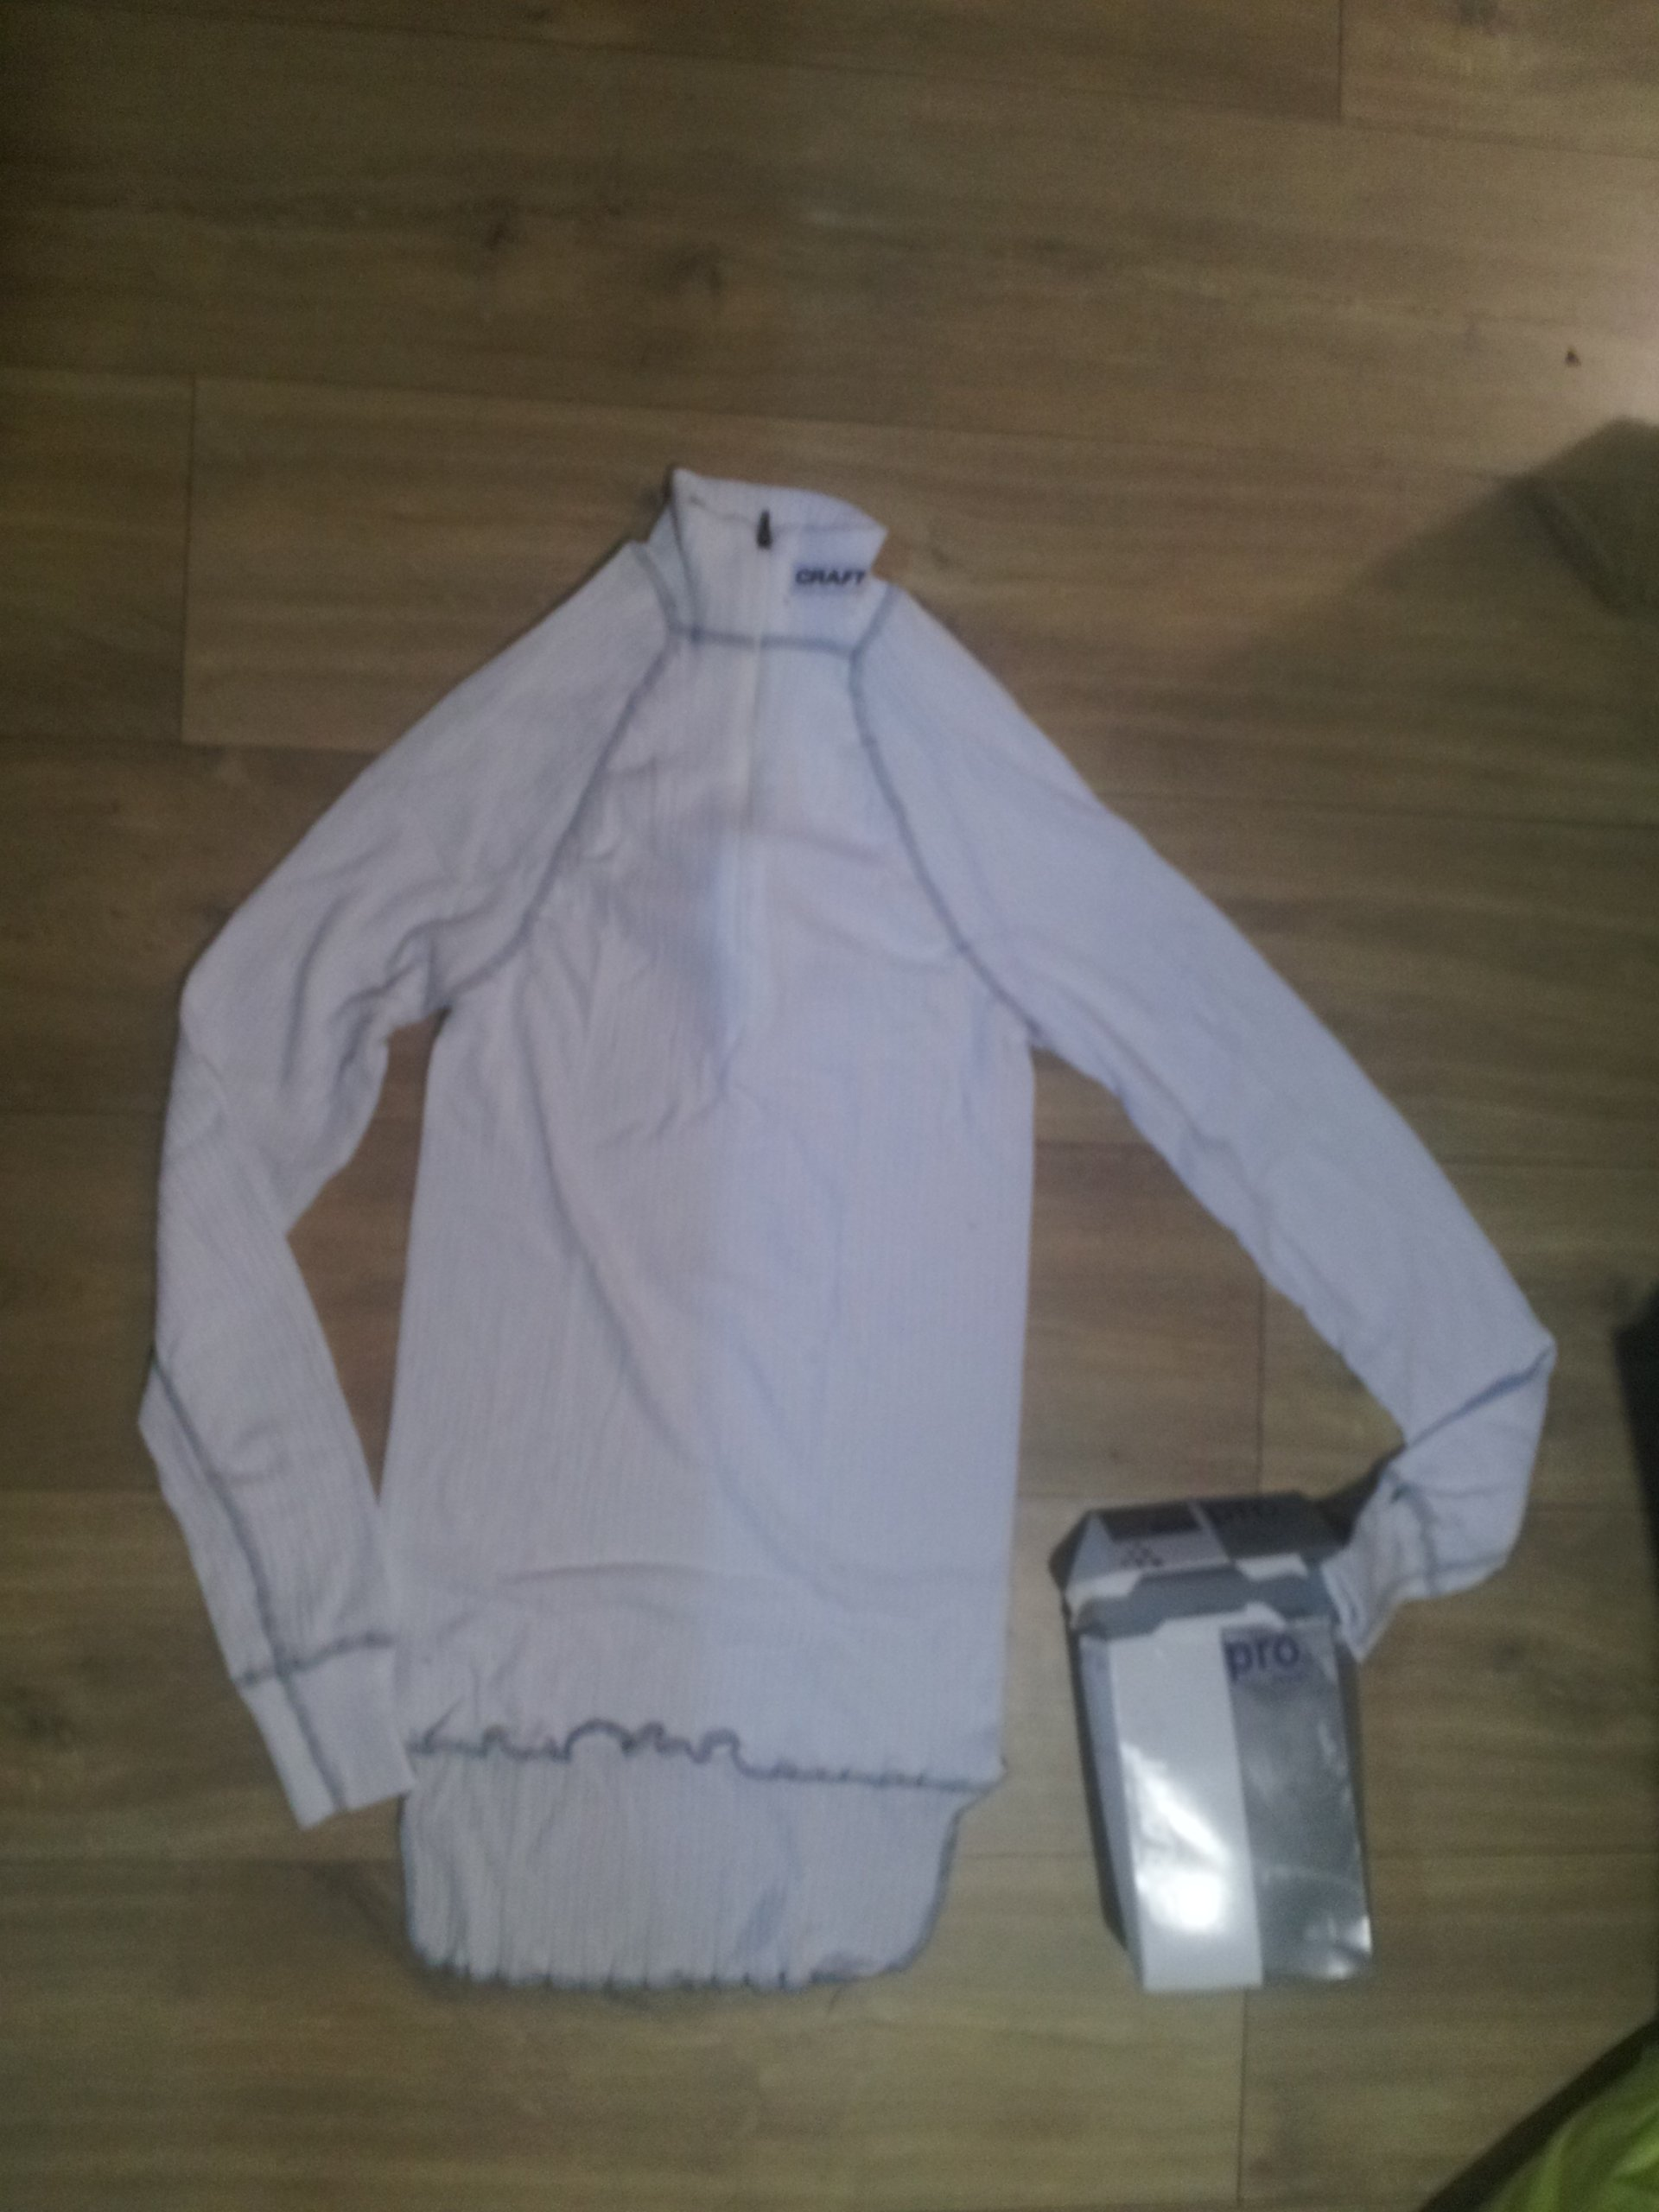 cbfd05f33 Craft Activ Zero koszulka bielizna termoaktywna S - 7115229557 ...